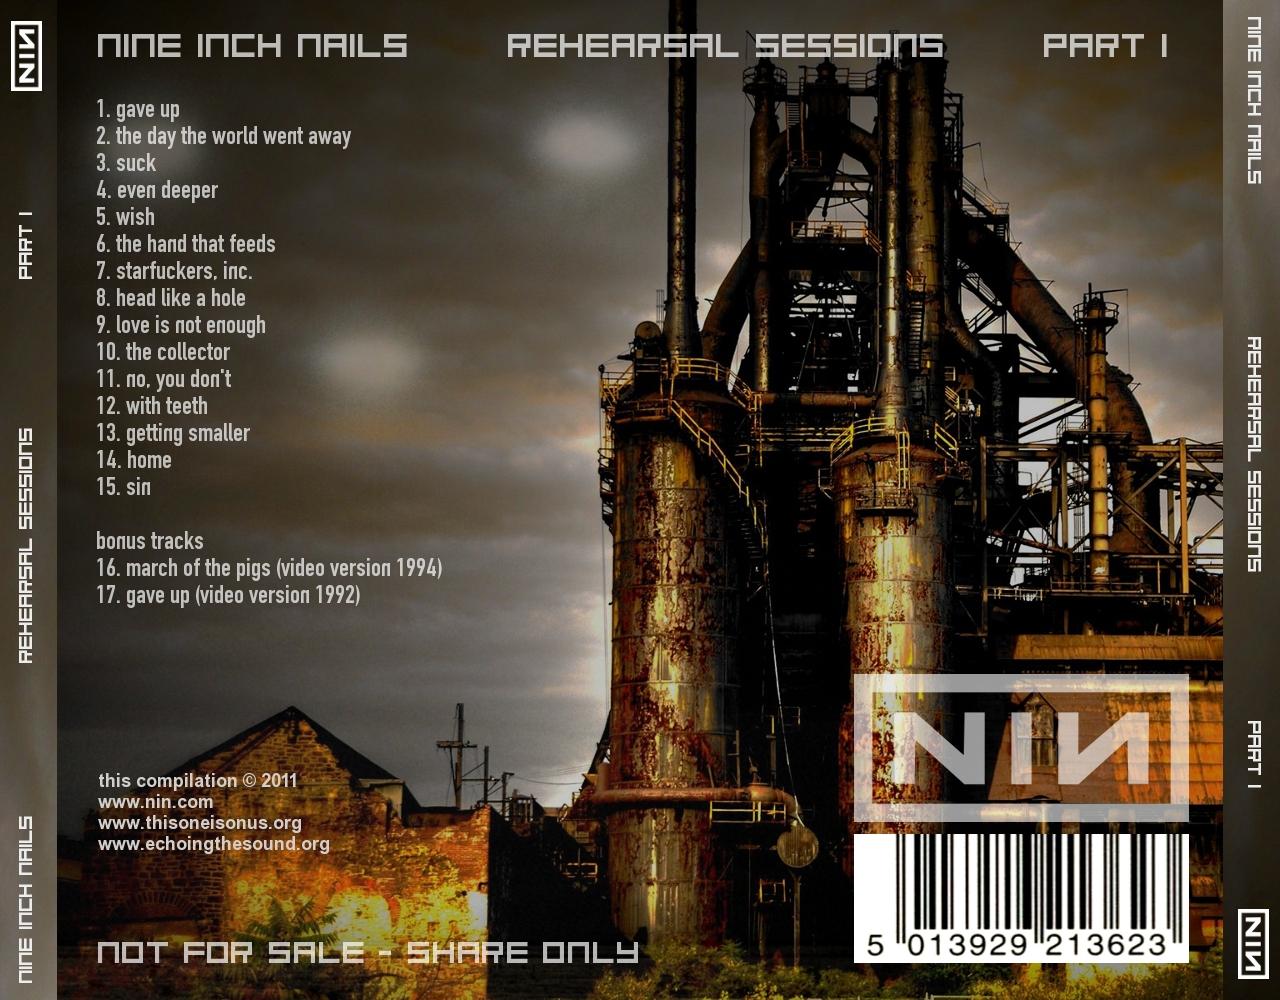 DARK CIRCLE ROOM: RE-UPLOAD: Nine Inch Nails - Rehearsal ...